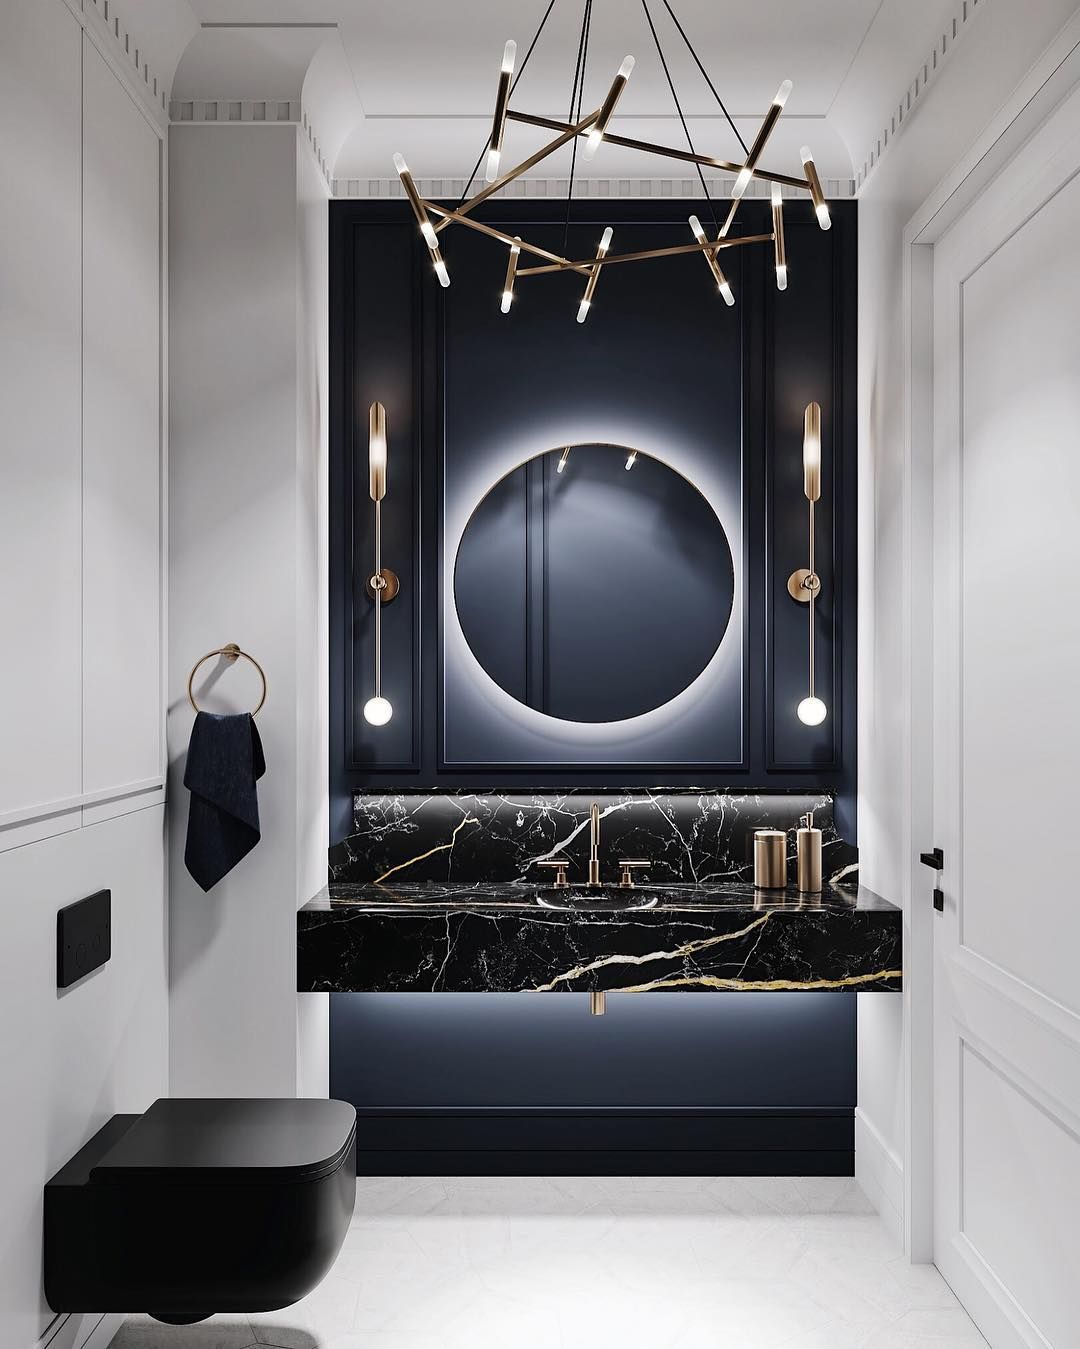 Dizajn Interera Moskva Quadro Room Instagram Photos And Videos Modern Luxury Bathroom Neoclassical Interior Design House Bathroom Designs